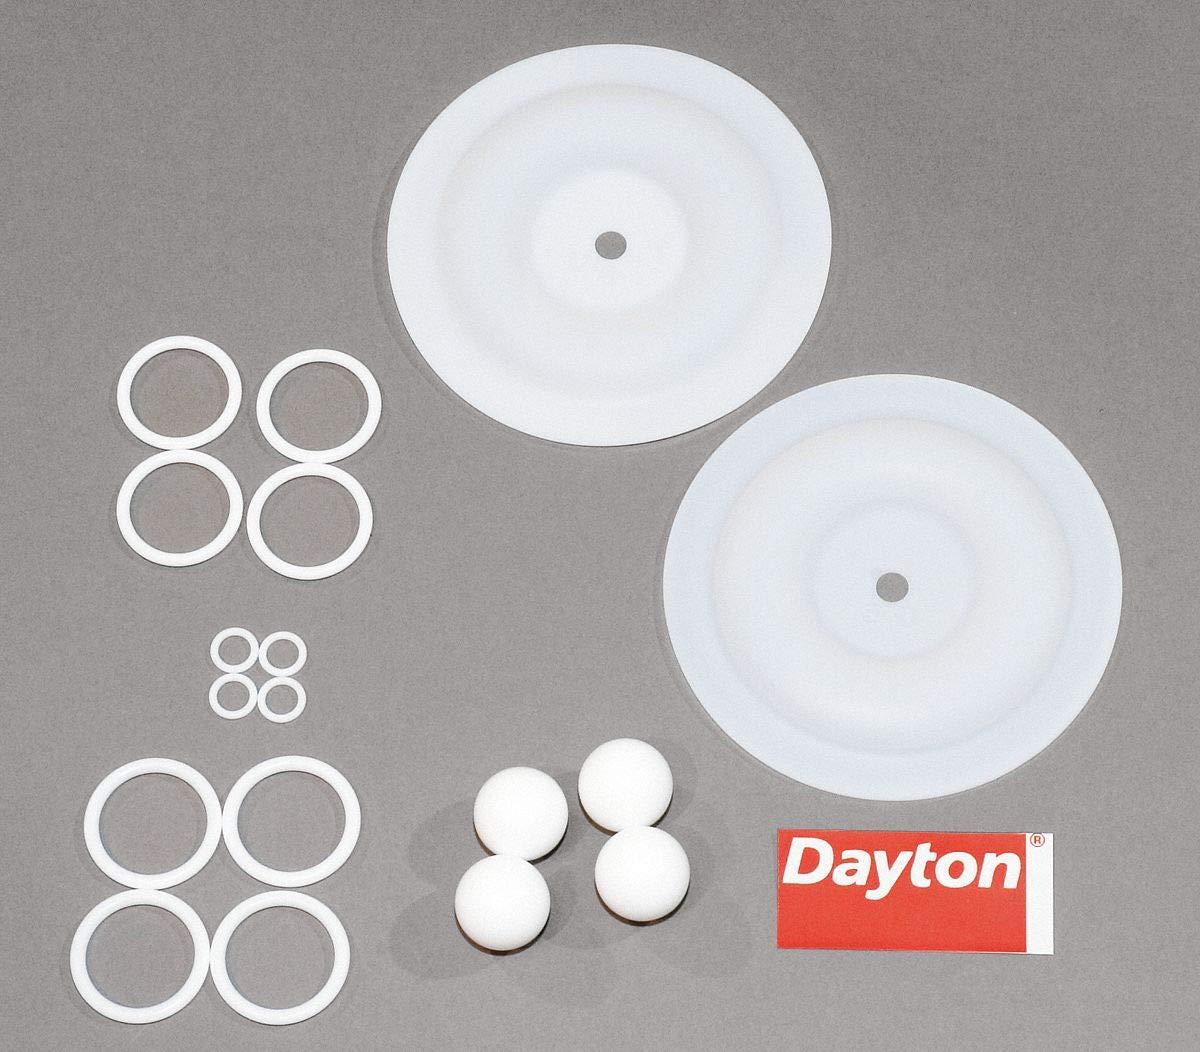 Dayton 6PY72 Pump Repair Kit, Fluid